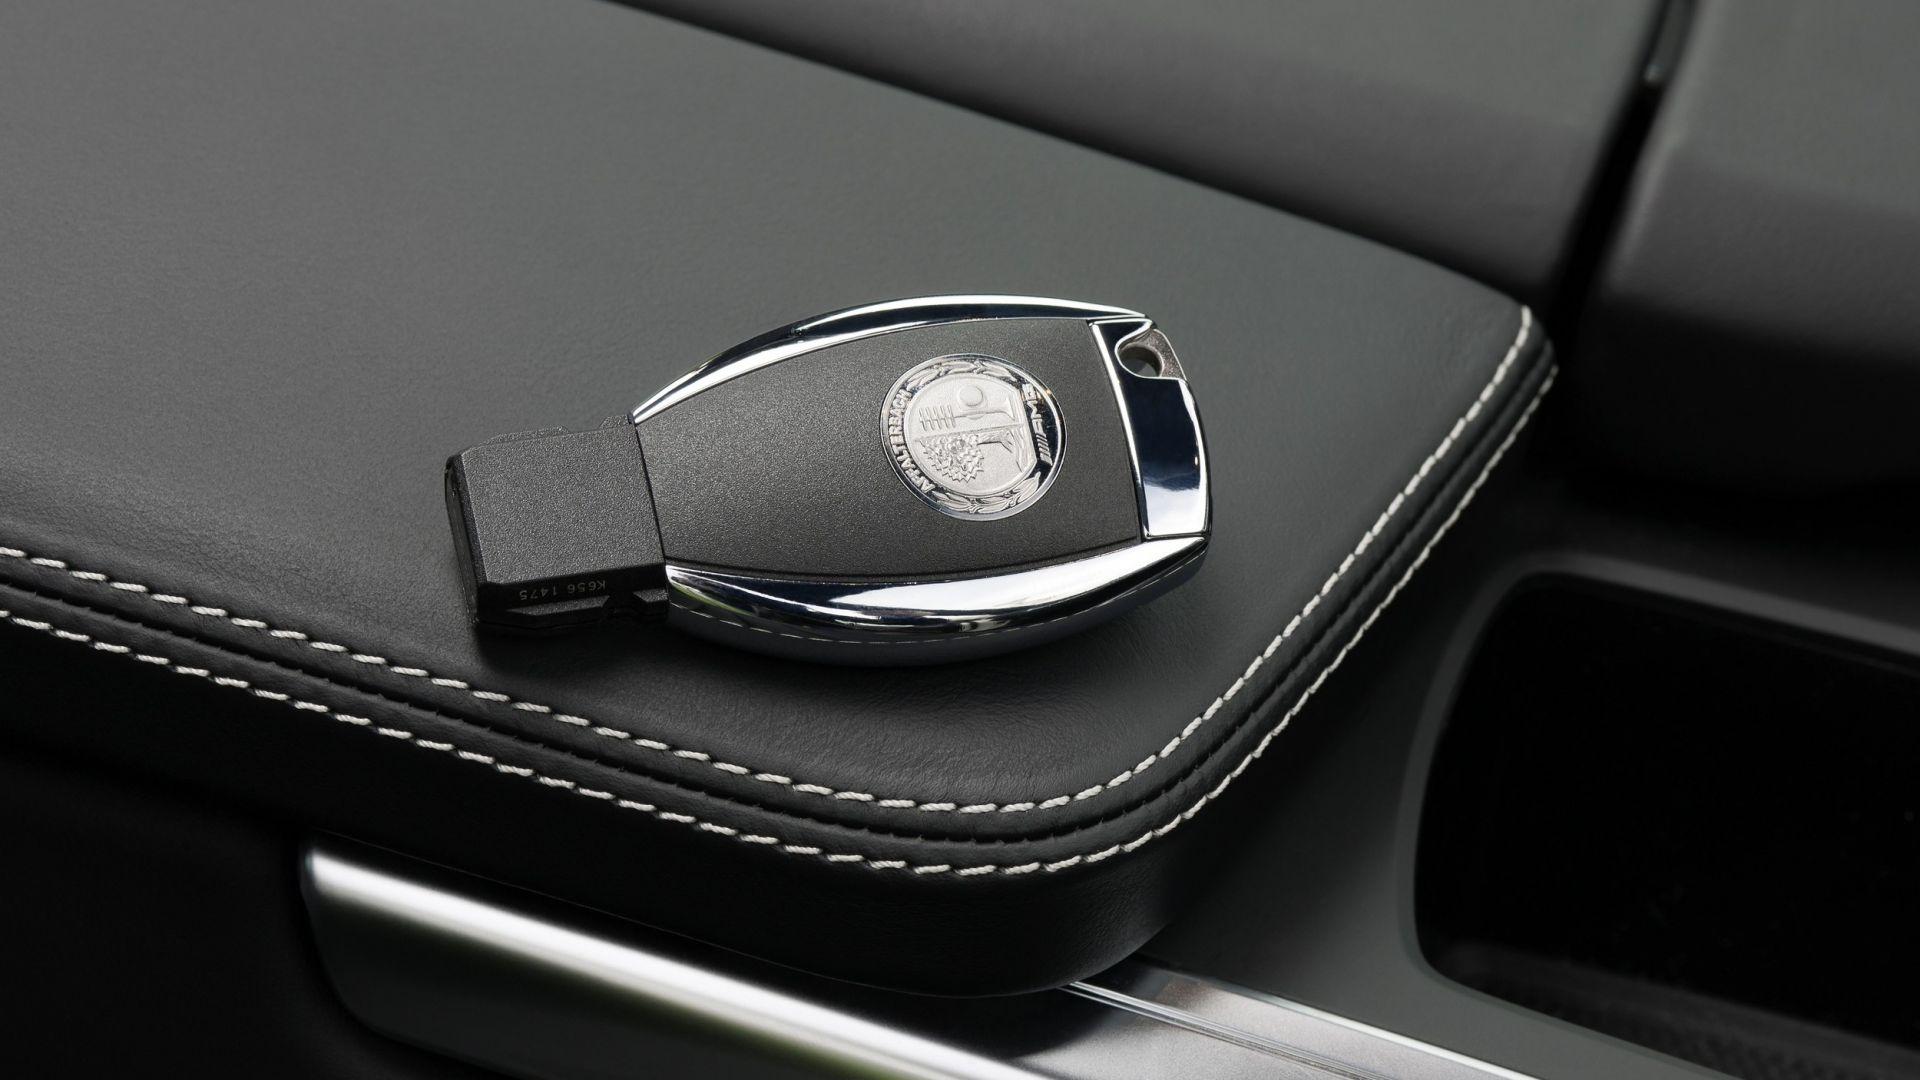 Prova mercedes gl 63 amg motorbox - Car key wallpaper ...